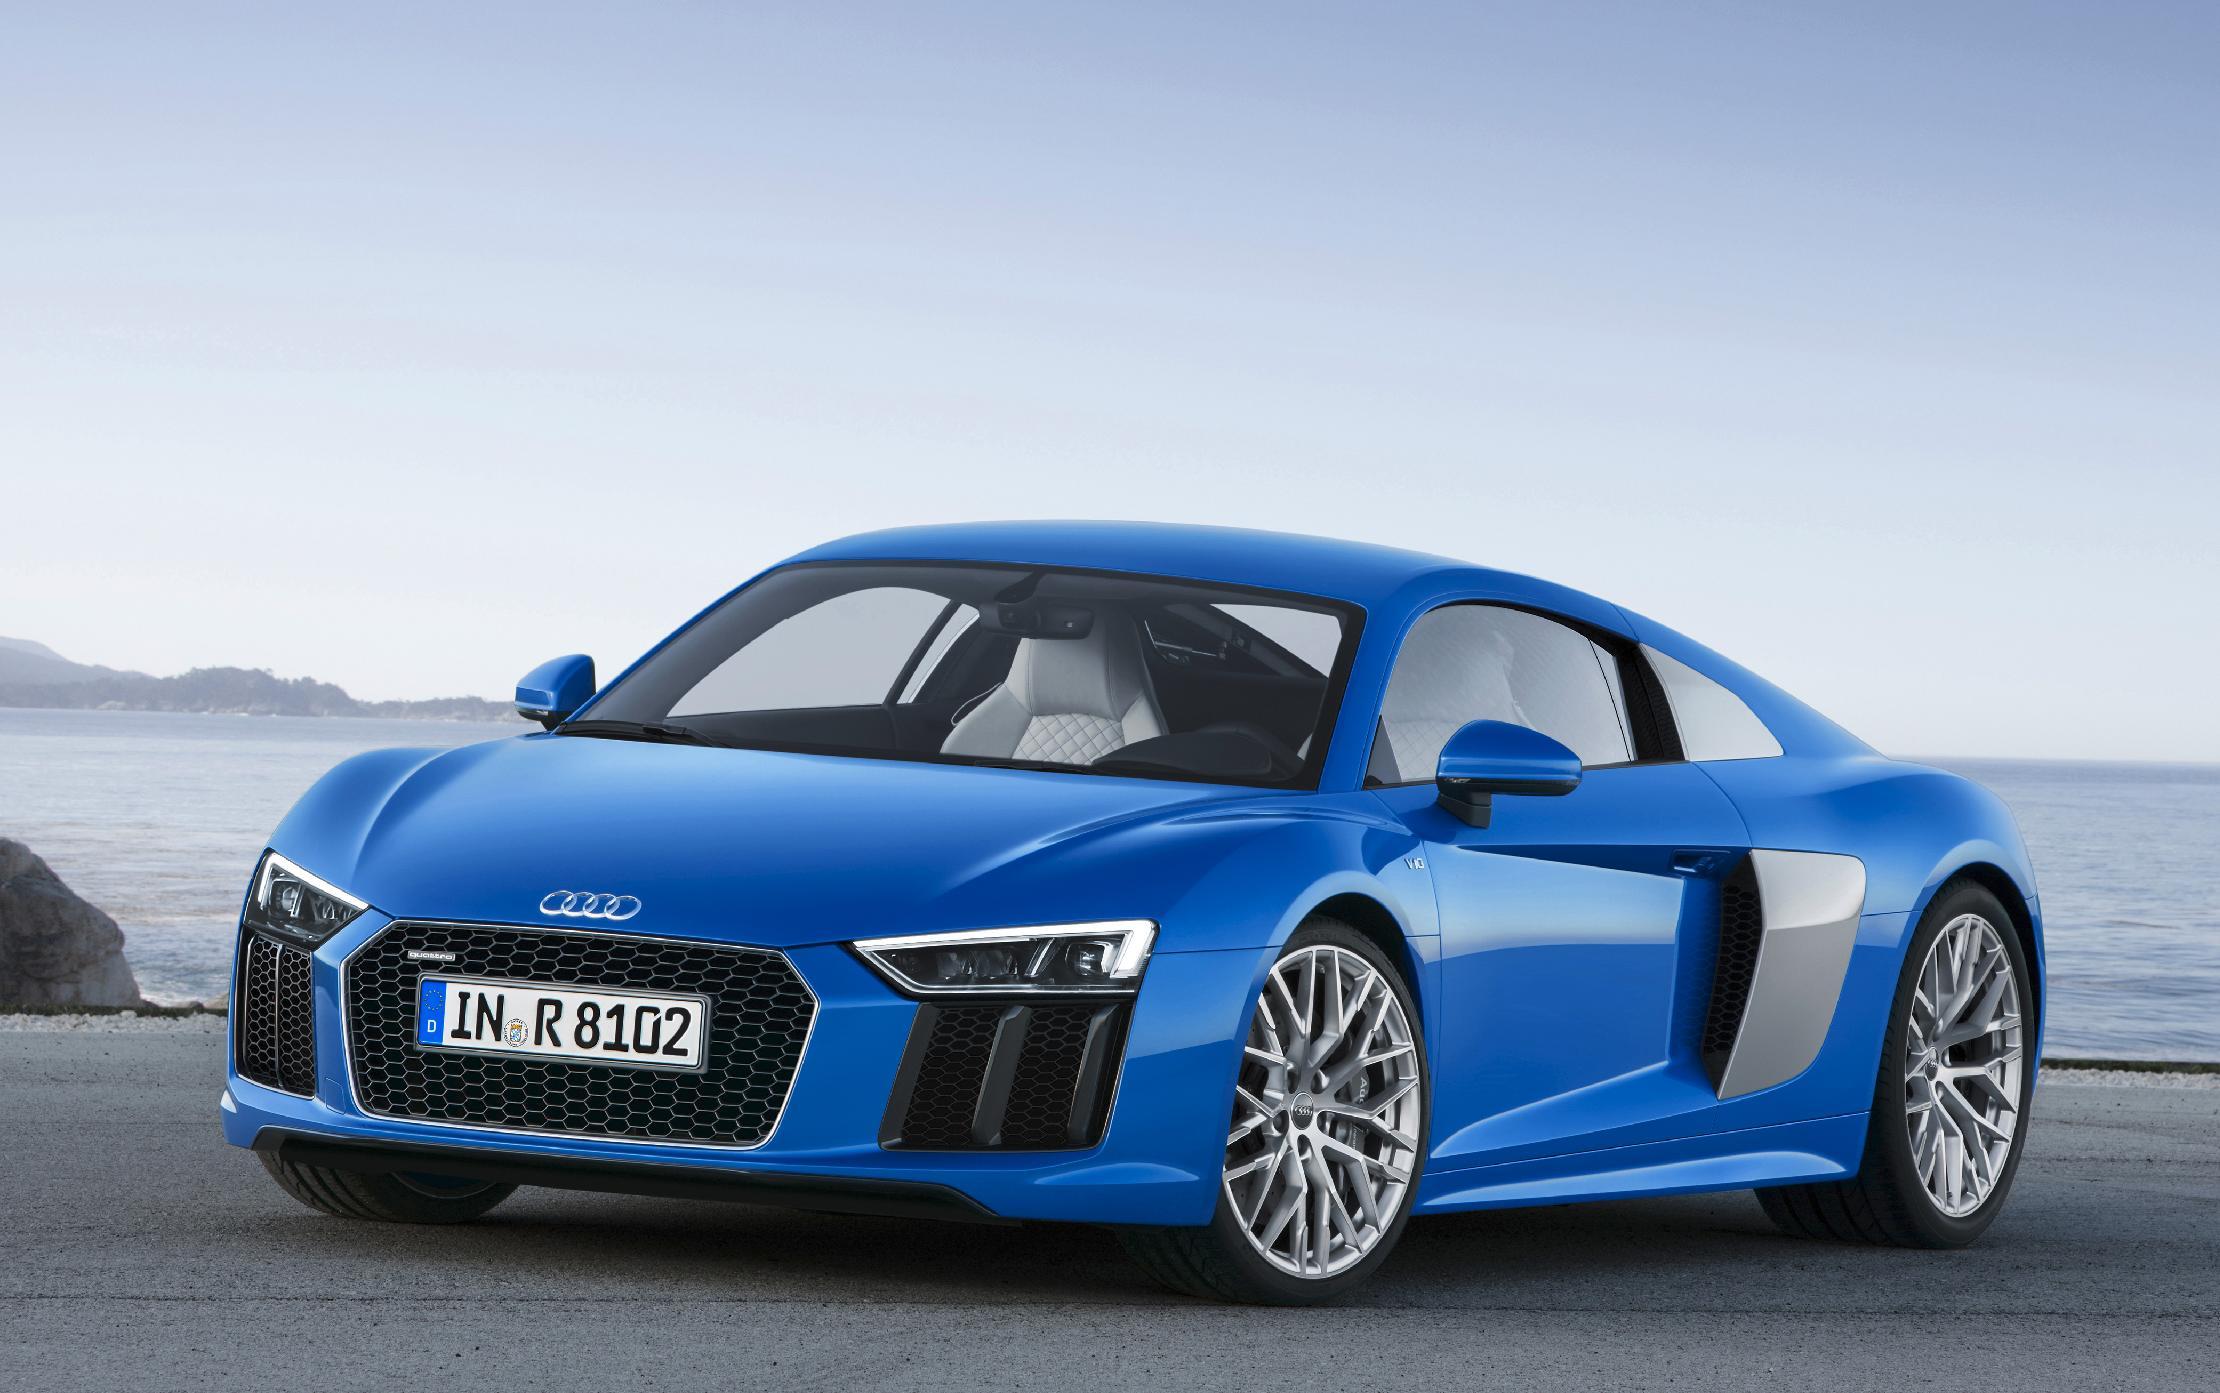 Small SUVs, pricey sports cars dominate at Geneva auto show